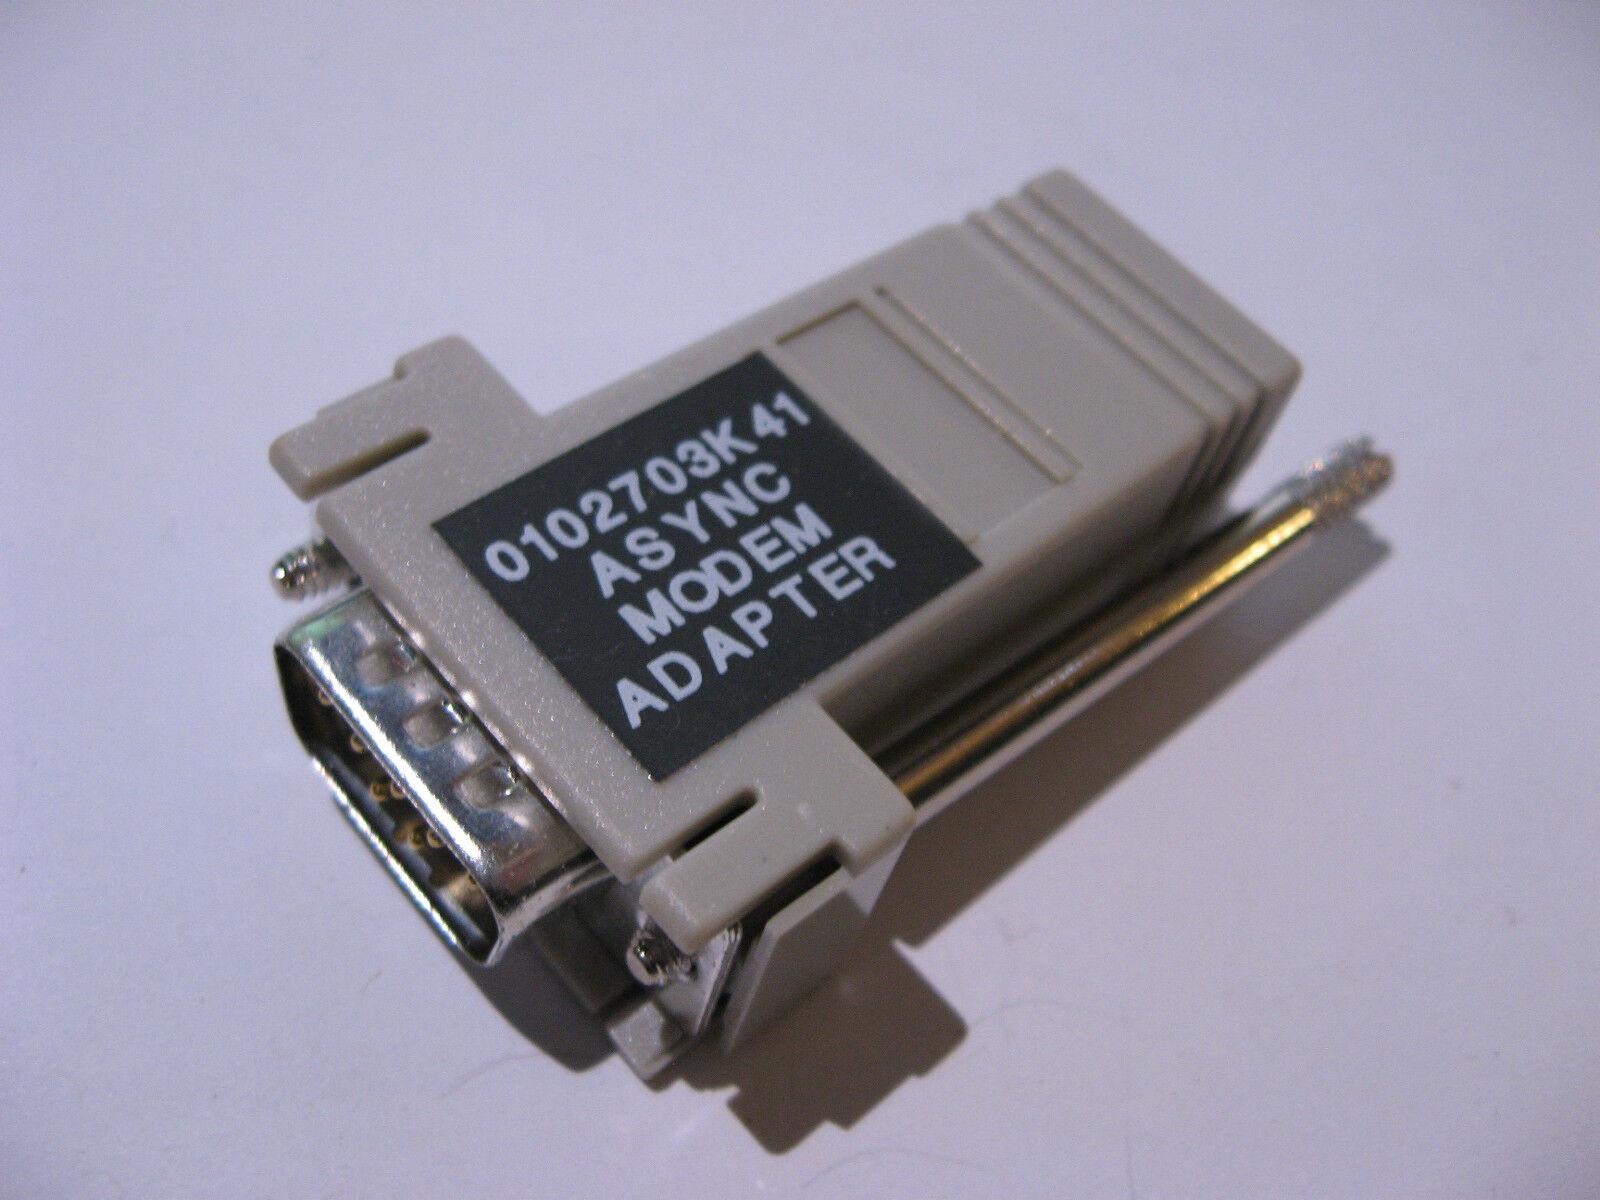 Motorola Radio Monitoring System 0102703k41 Db 9 Async Modem Adapter Circuit Picture 1 Of 3